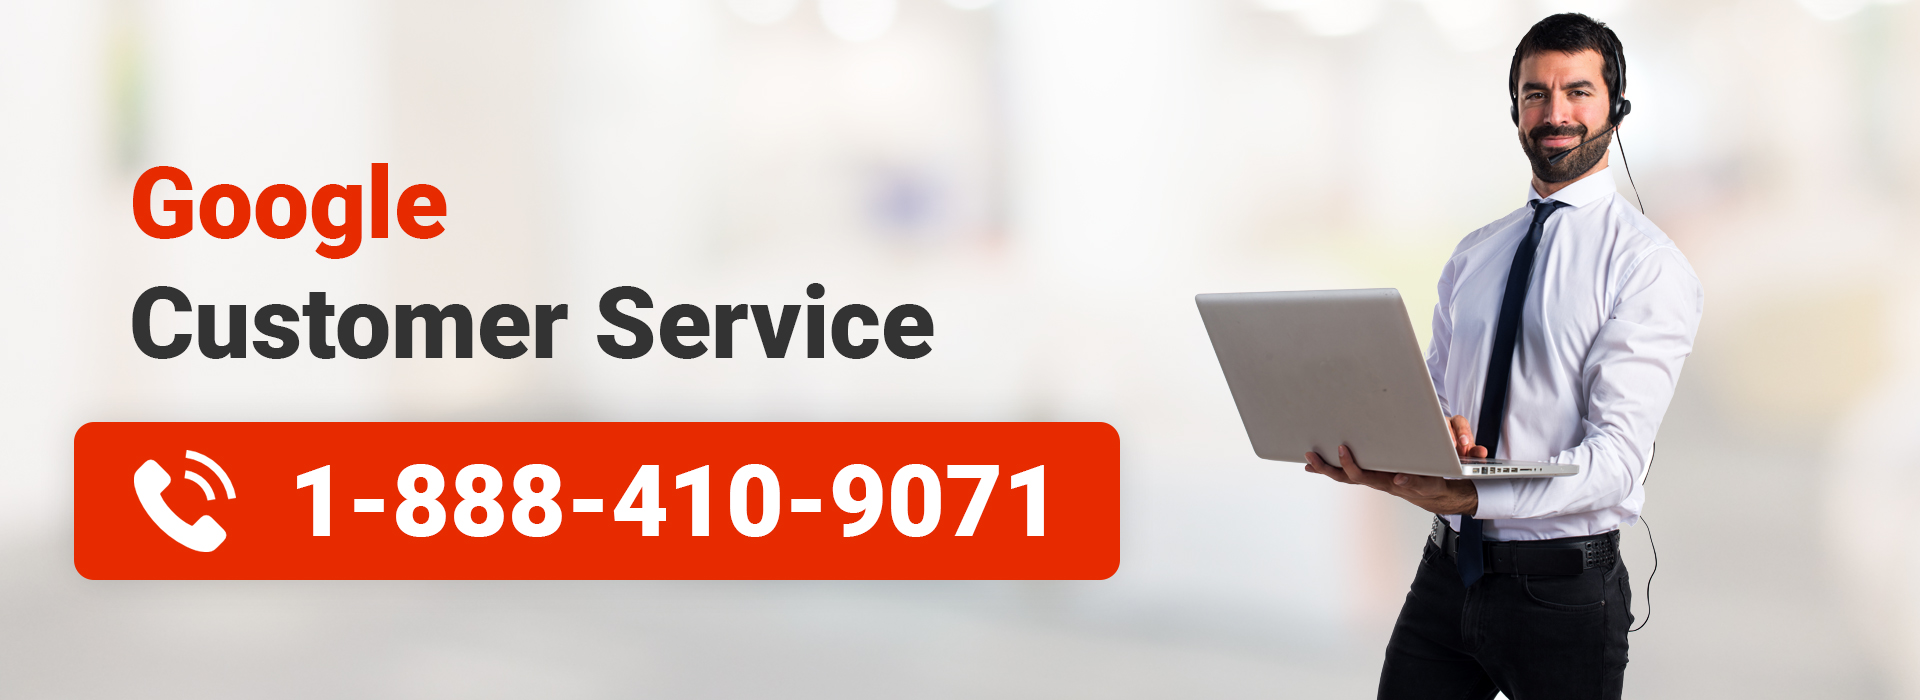 Google Customer Service 1-888-410-9071